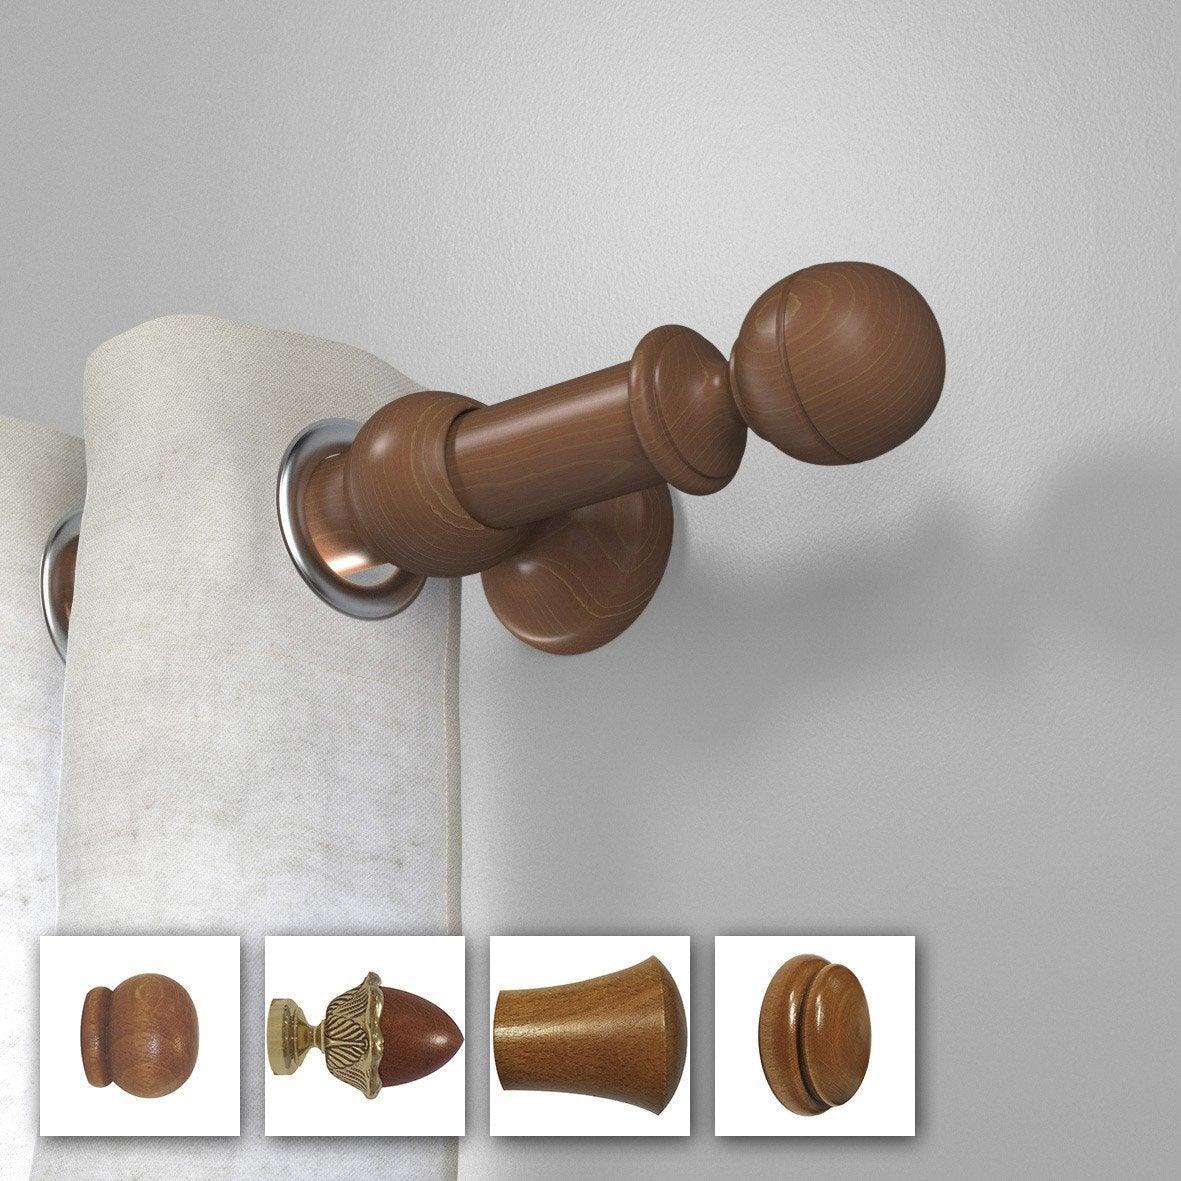 tringle rideau composer inspire tradi d35 merisier. Black Bedroom Furniture Sets. Home Design Ideas